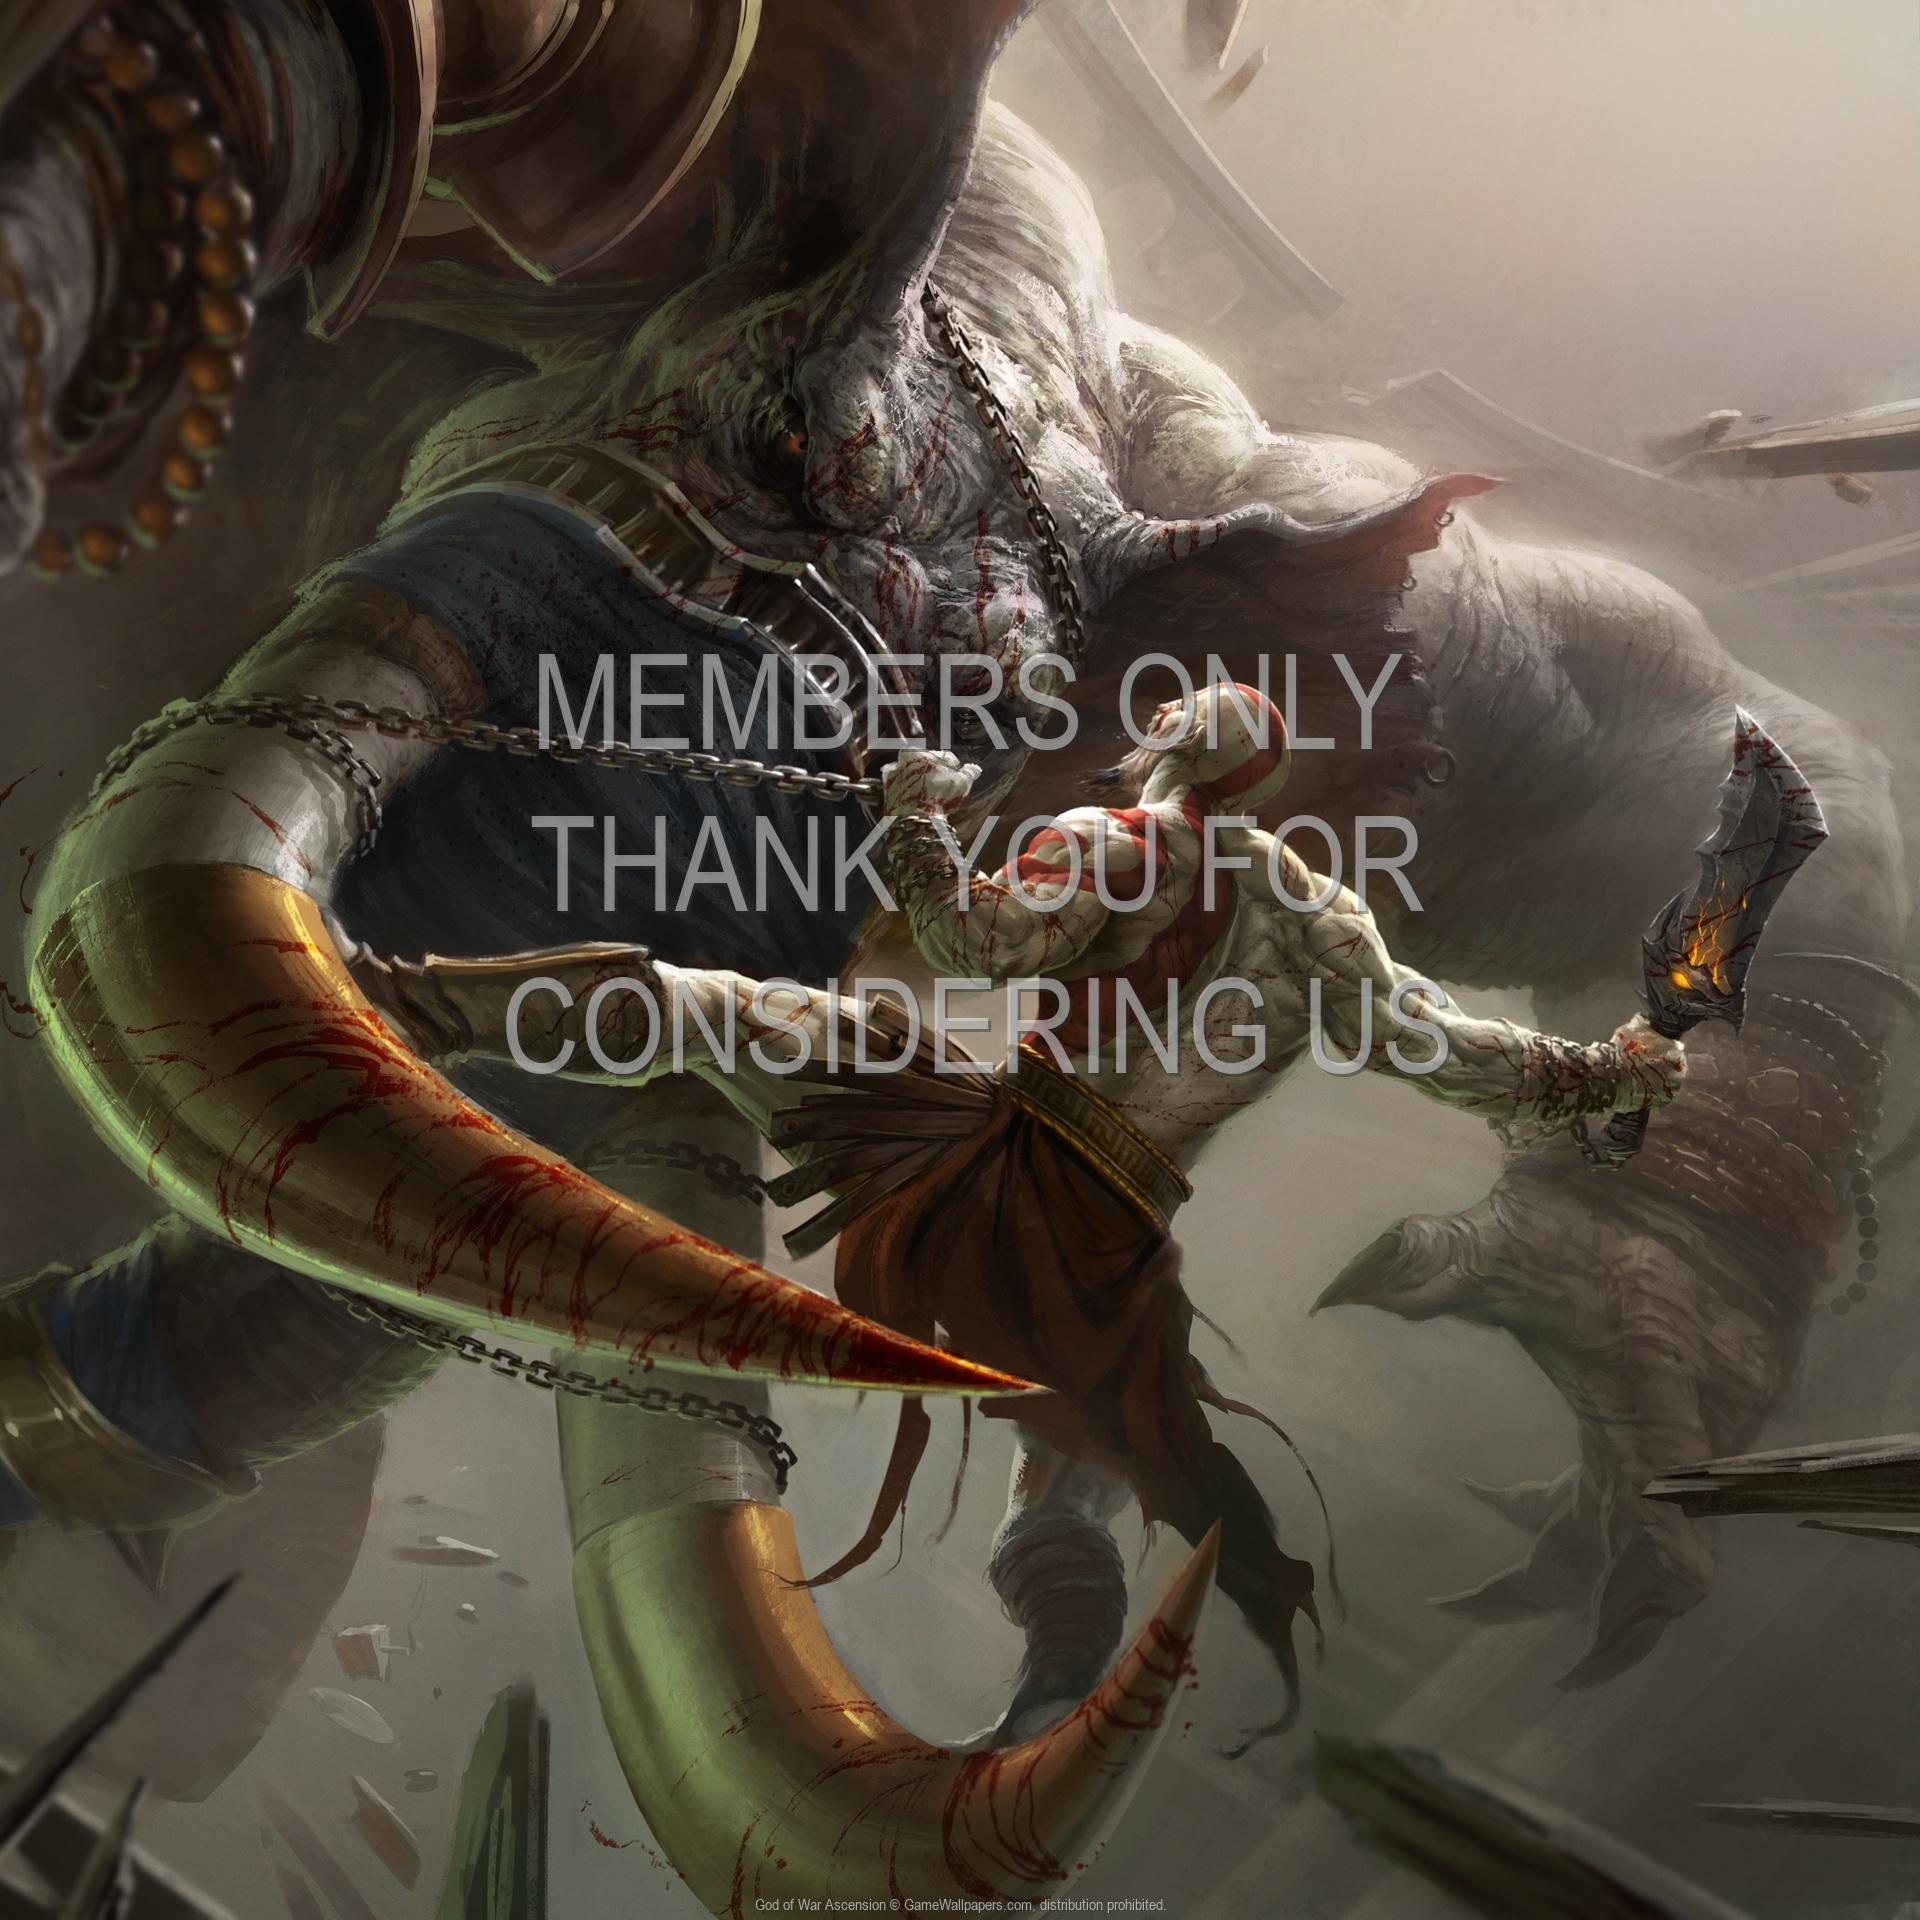 God of War: Ascension 1920x1080 Handy Hintergrundbild 03